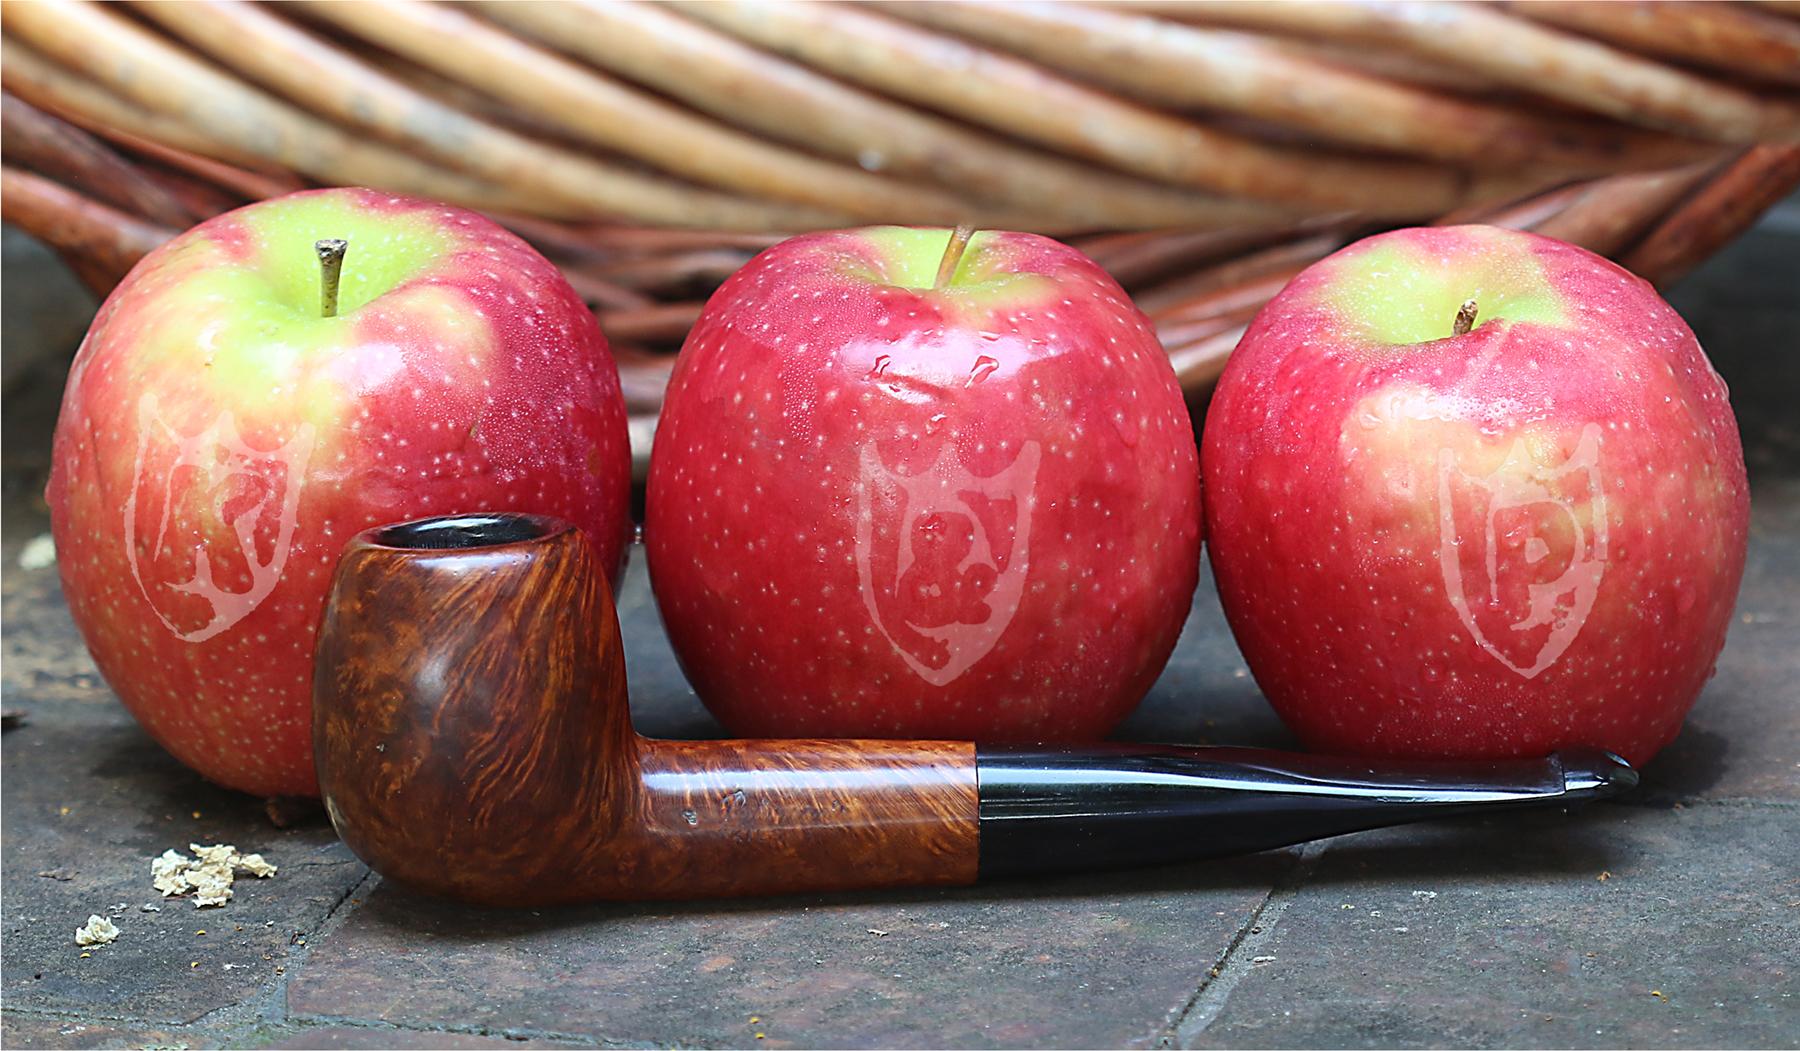 230. K&P's Apple Tree: A Visual History of the Shape